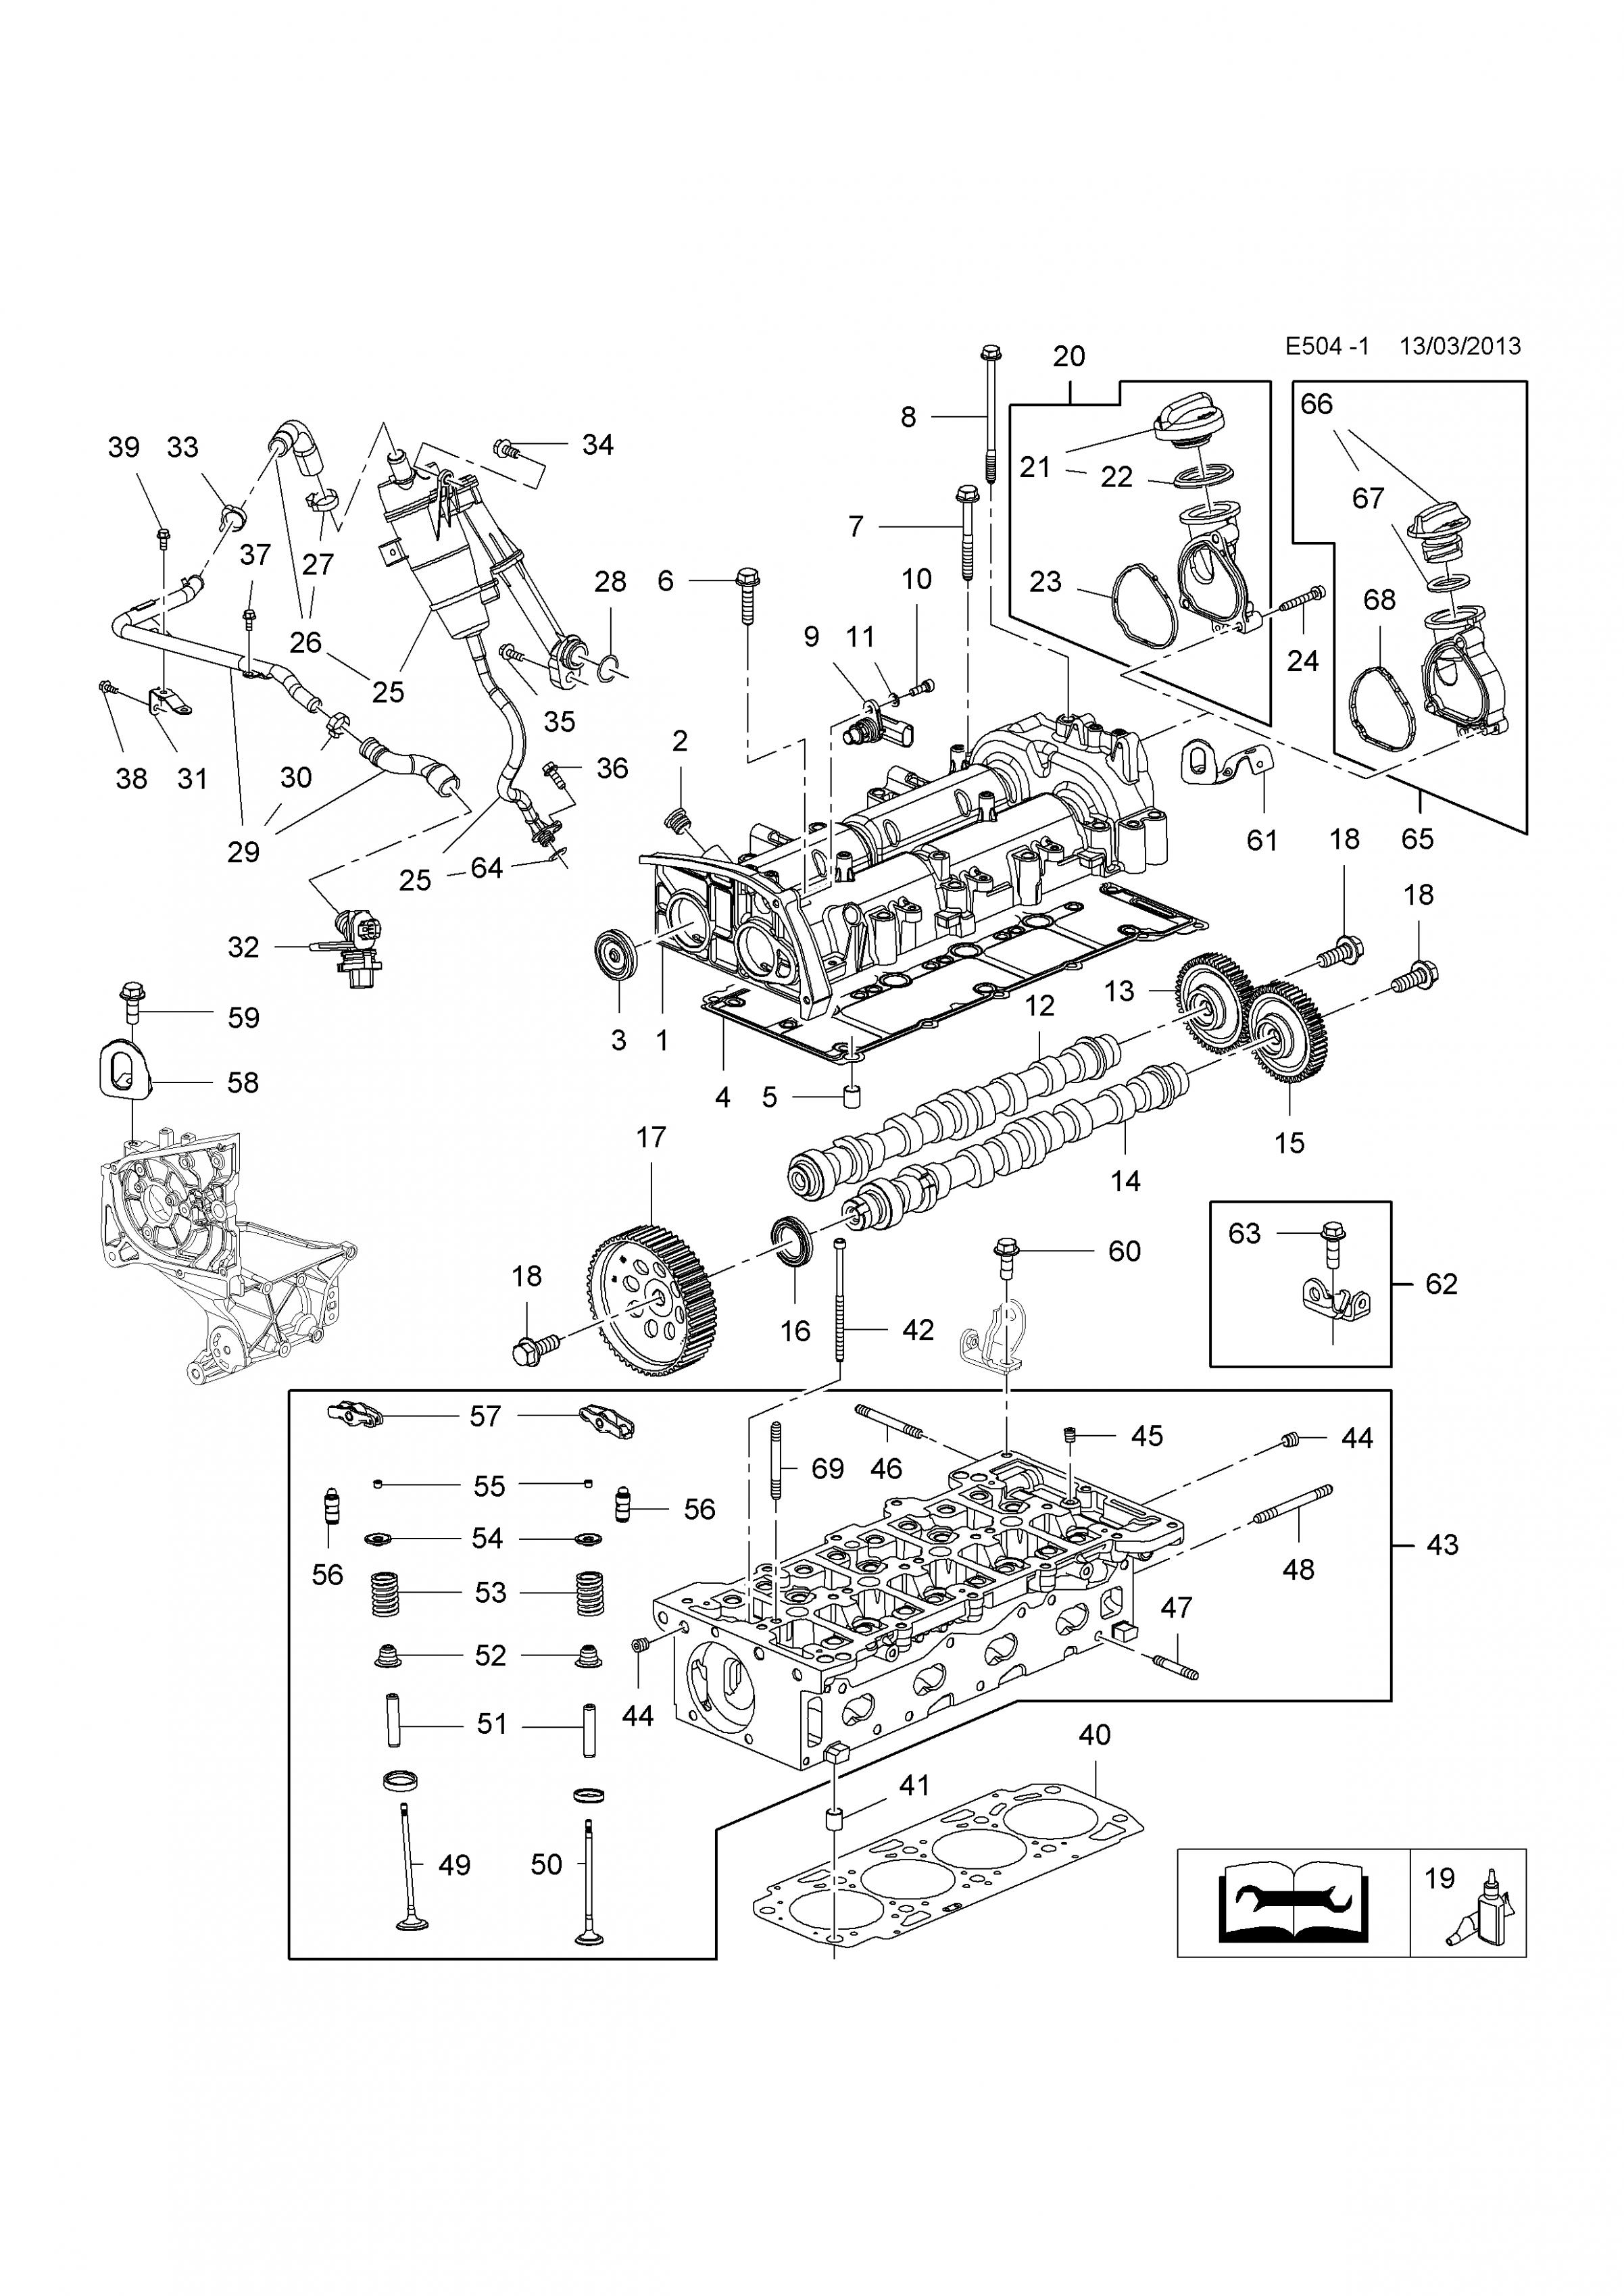 Vauxhall Insignia Diesel Engine Diagram In 2020 Vauxhall Insignia Vauxhall Diesel Engine